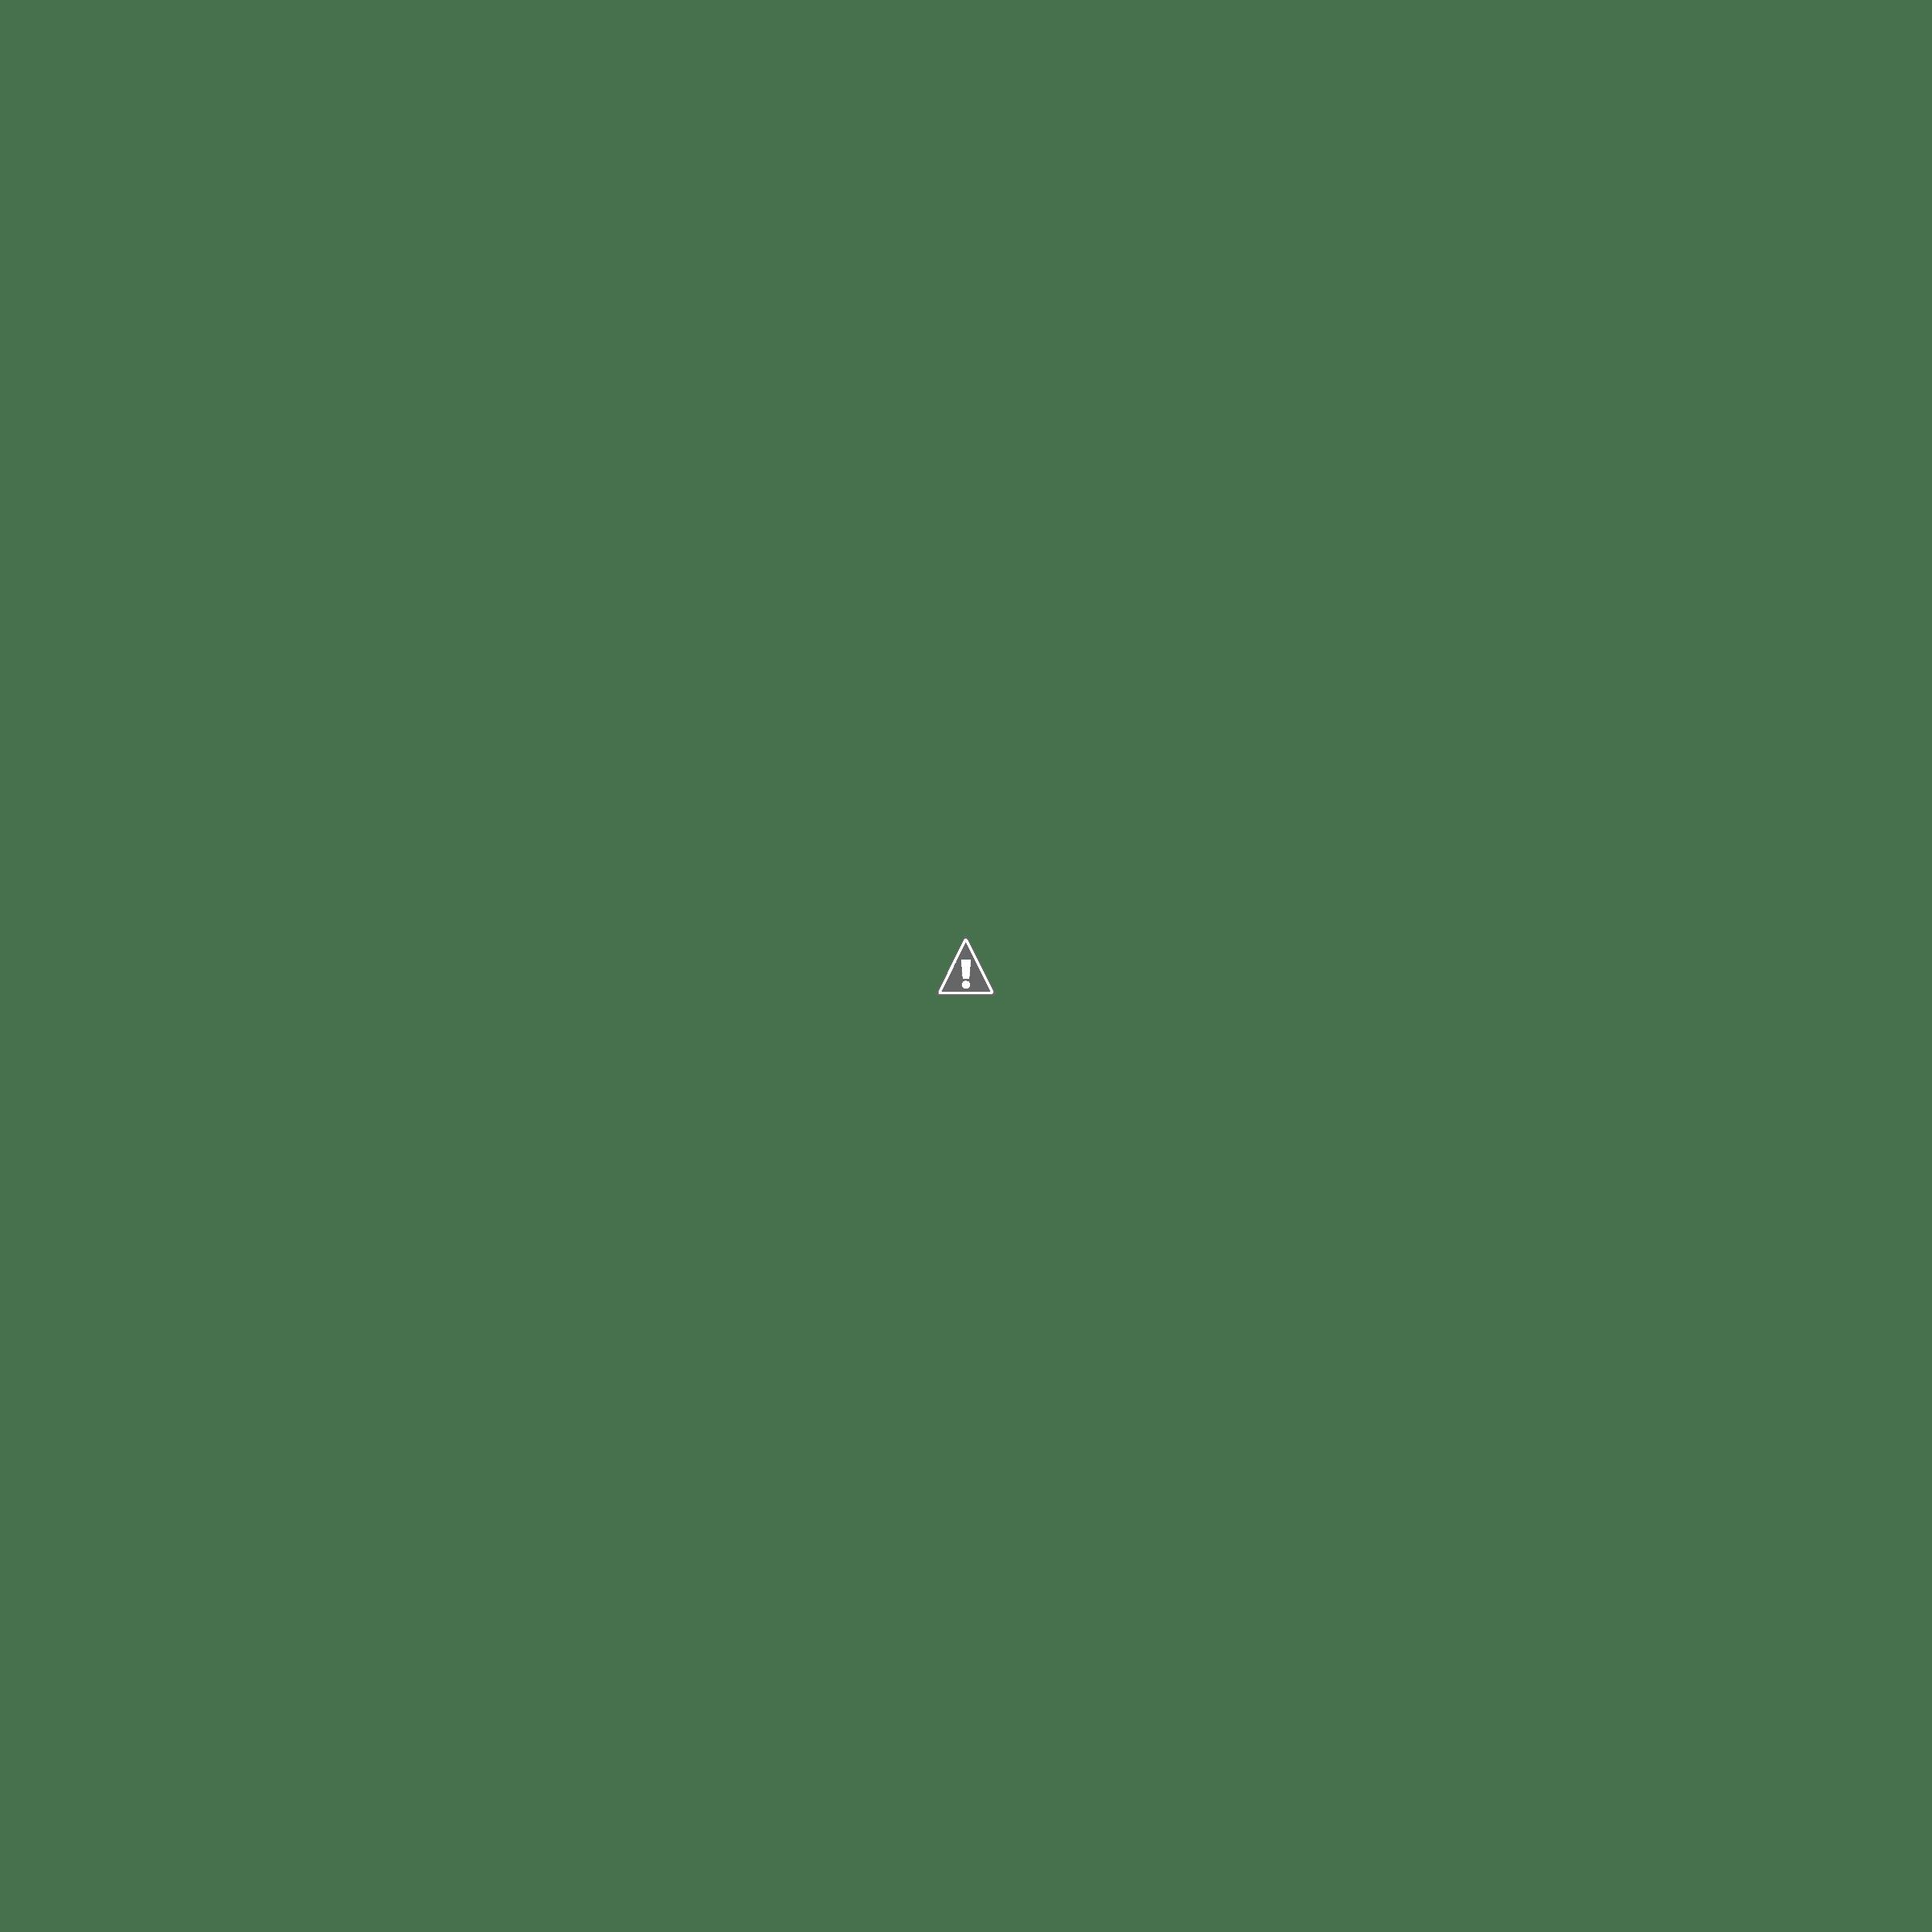 IMAGE(https://lh3.googleusercontent.com/WY3Pg3oe-QWMG8by5yx4Yhmm4CQTyRL3ctFrPv9YvtXPG5yubEdiWPGj5QaL41VaDkgDChVSMHyJLcgcpzDEov3buM9DblOd1bW1MSPsa4j7PSyaUQ1caS8A4UqpTHAl-VcVuitaJw=w2400)